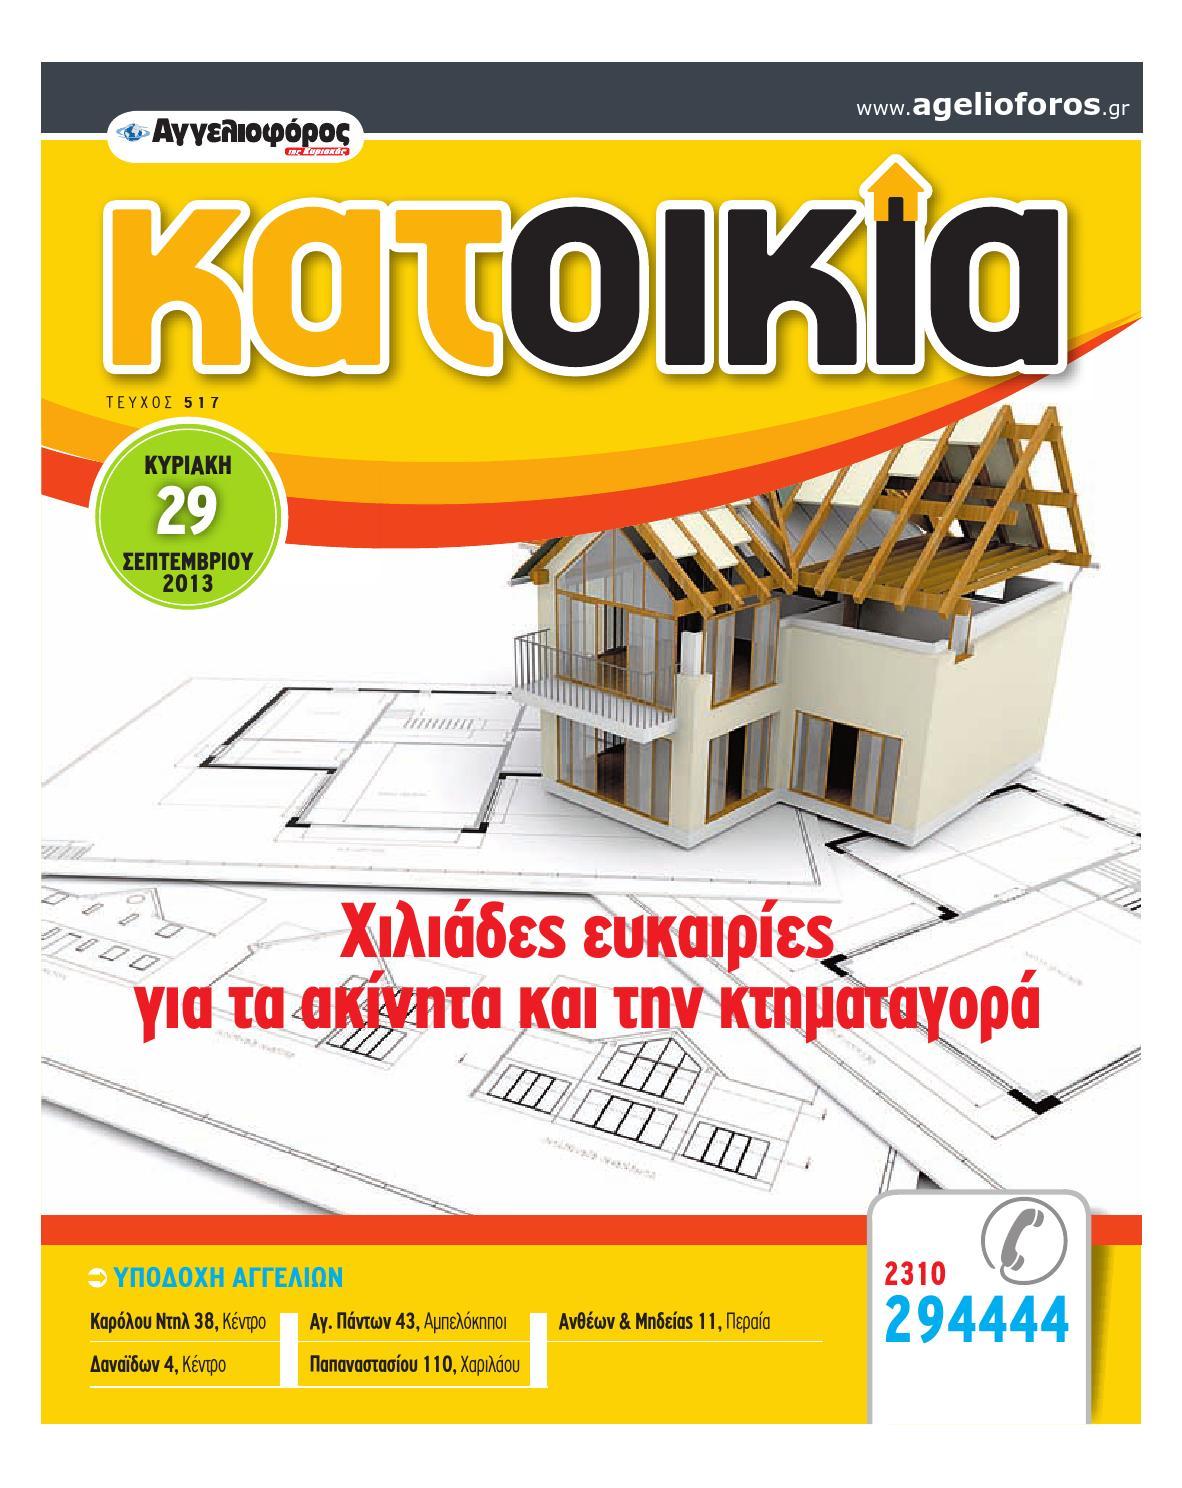 02c4ebf9567 Κατοικία 29/09/2013 by Εκδοτική Βορείου Ελλάδος Α.Ε. - issuu